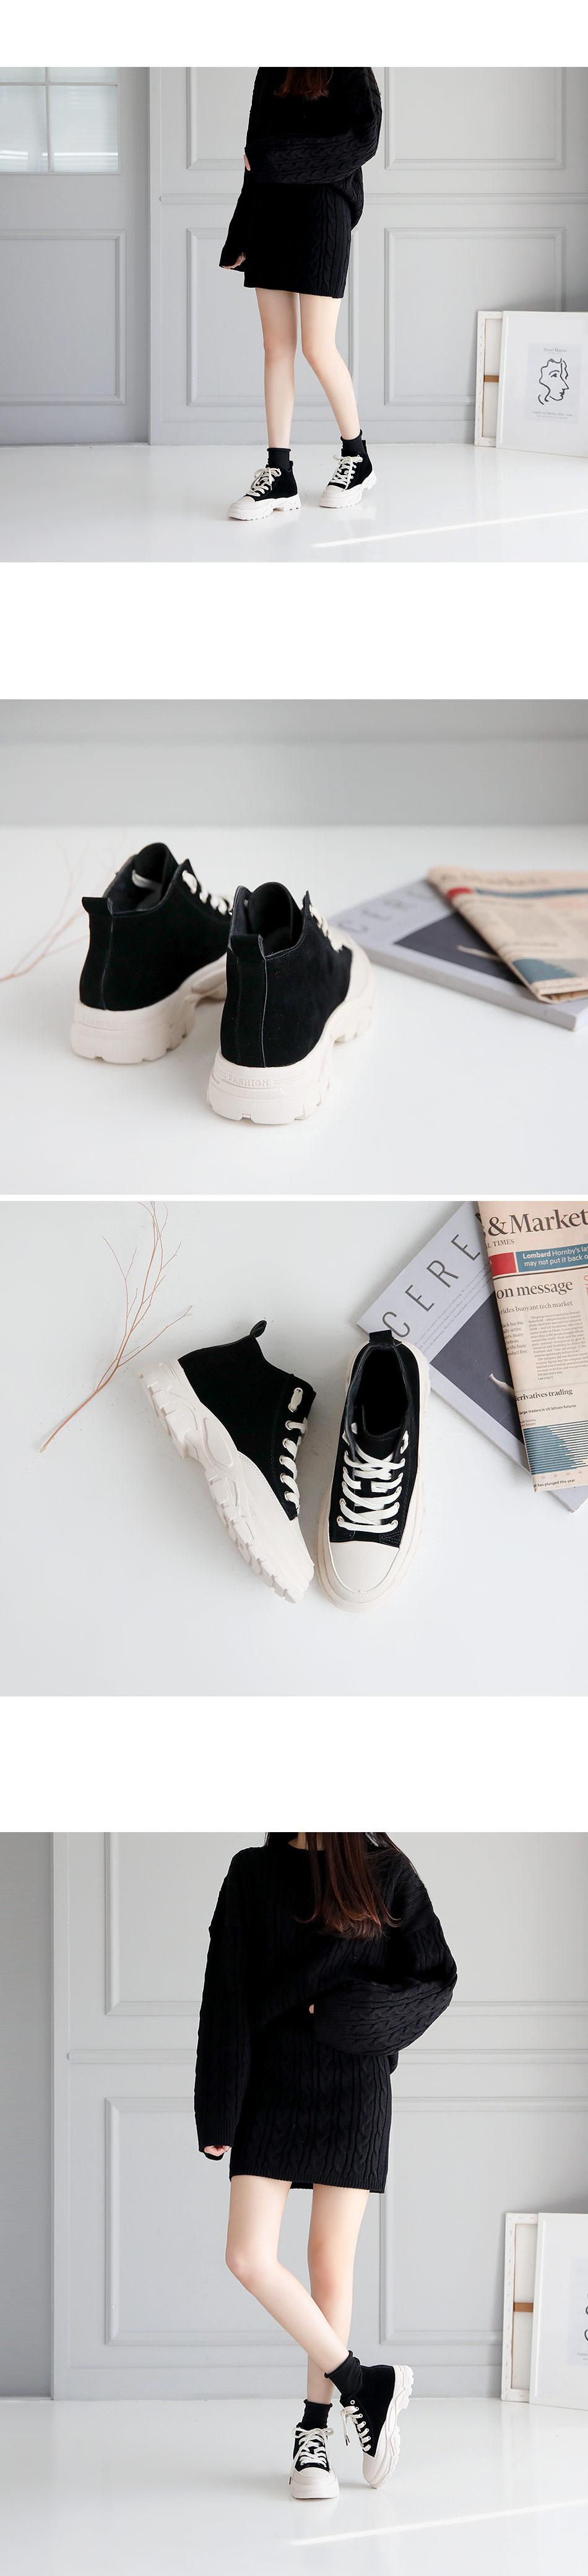 MiloTZ sneakers 4cm